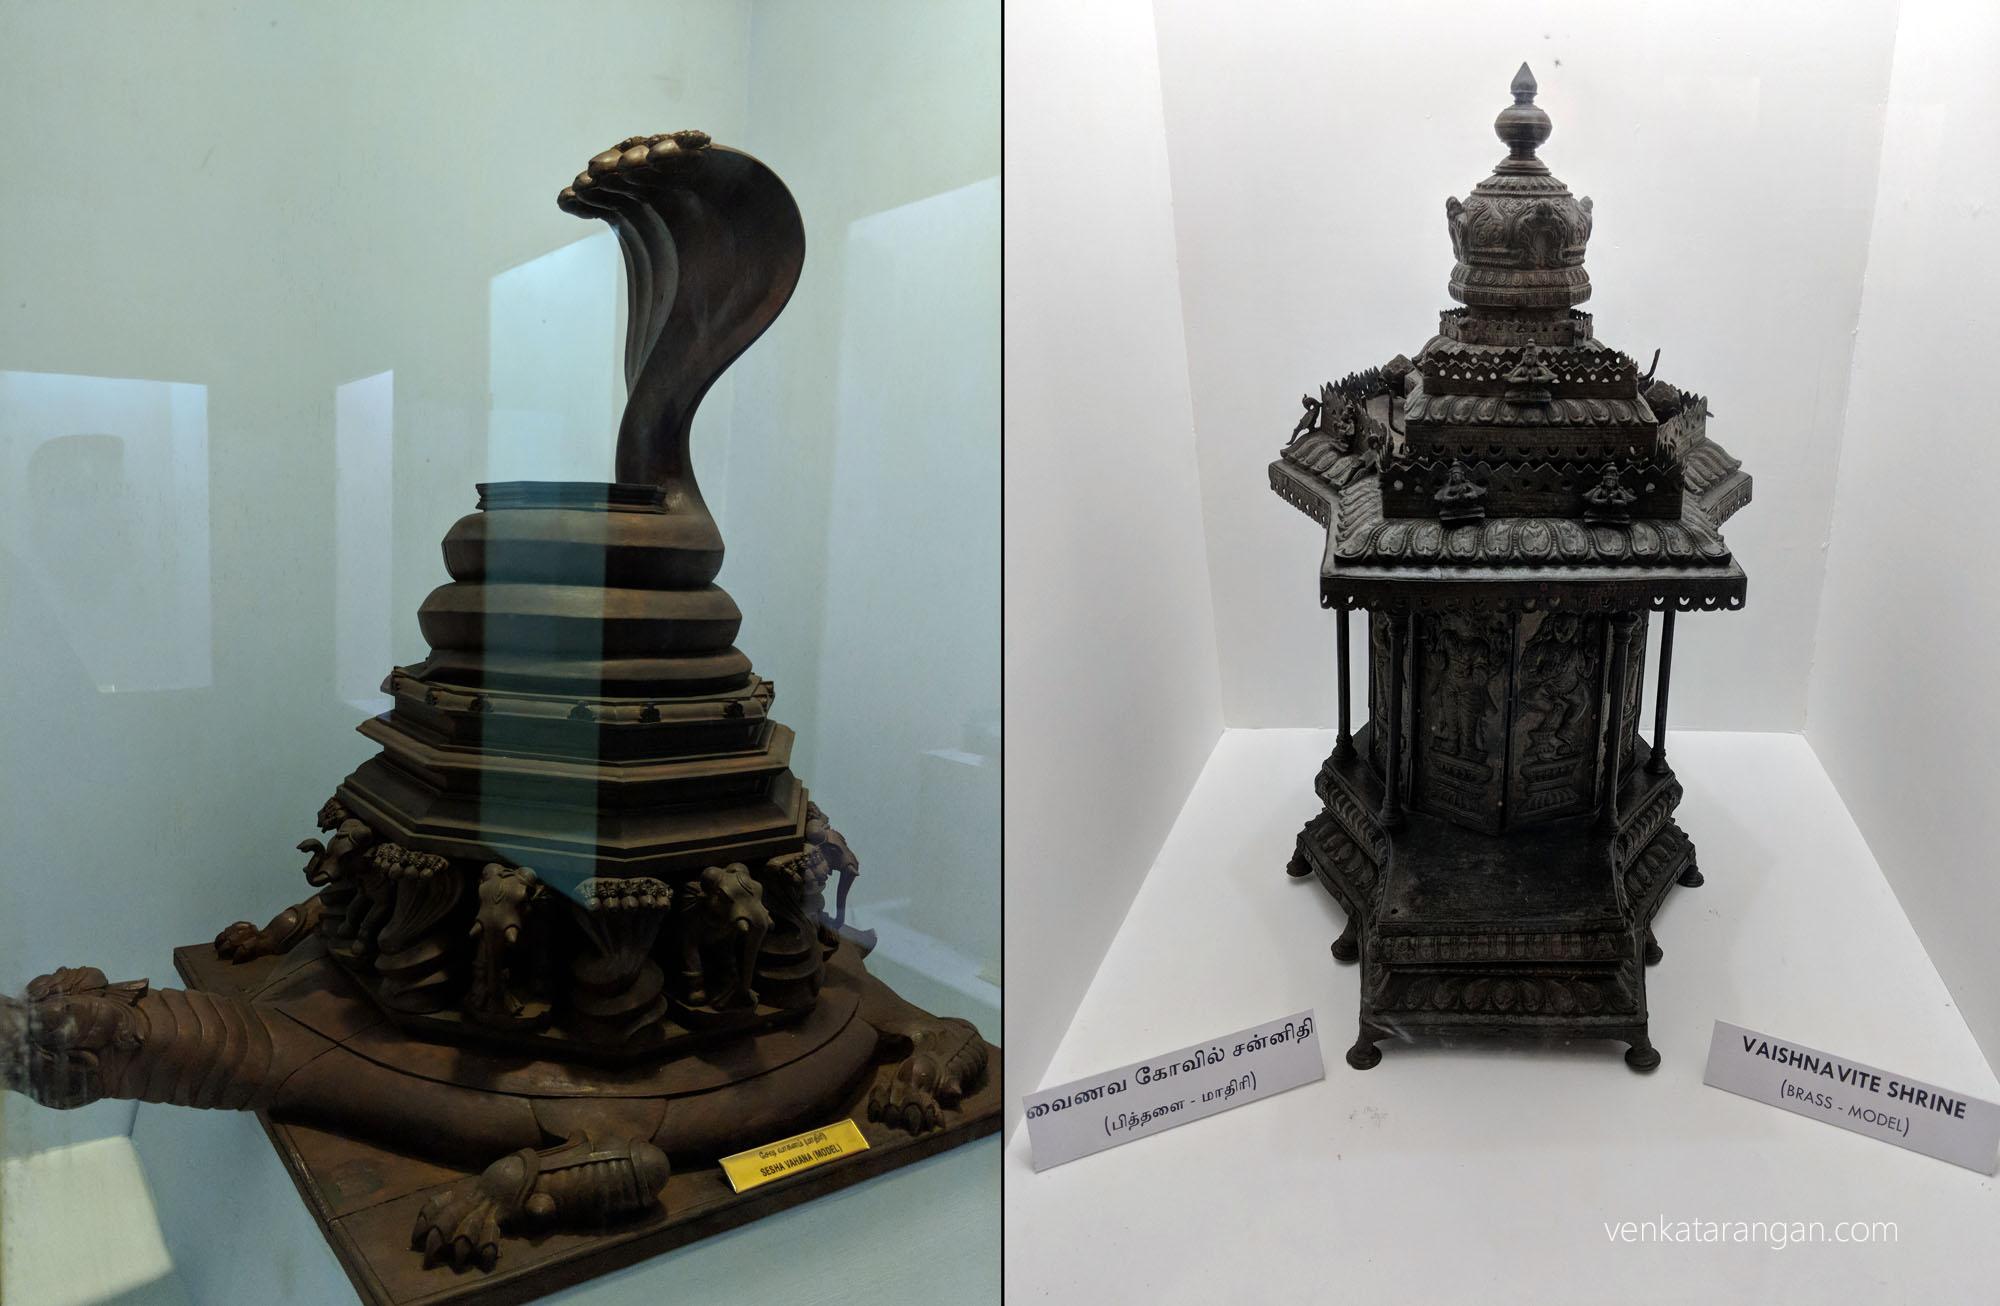 Left-Sesha Vahana model (சேஷ வாகனம்). The shape of a snake, vehicle of Lord Vishnu during festivals. Right-Vaishnavite Shrine, model made of Brass (வைணவ கோவில் சந்நித, பித்தளை)